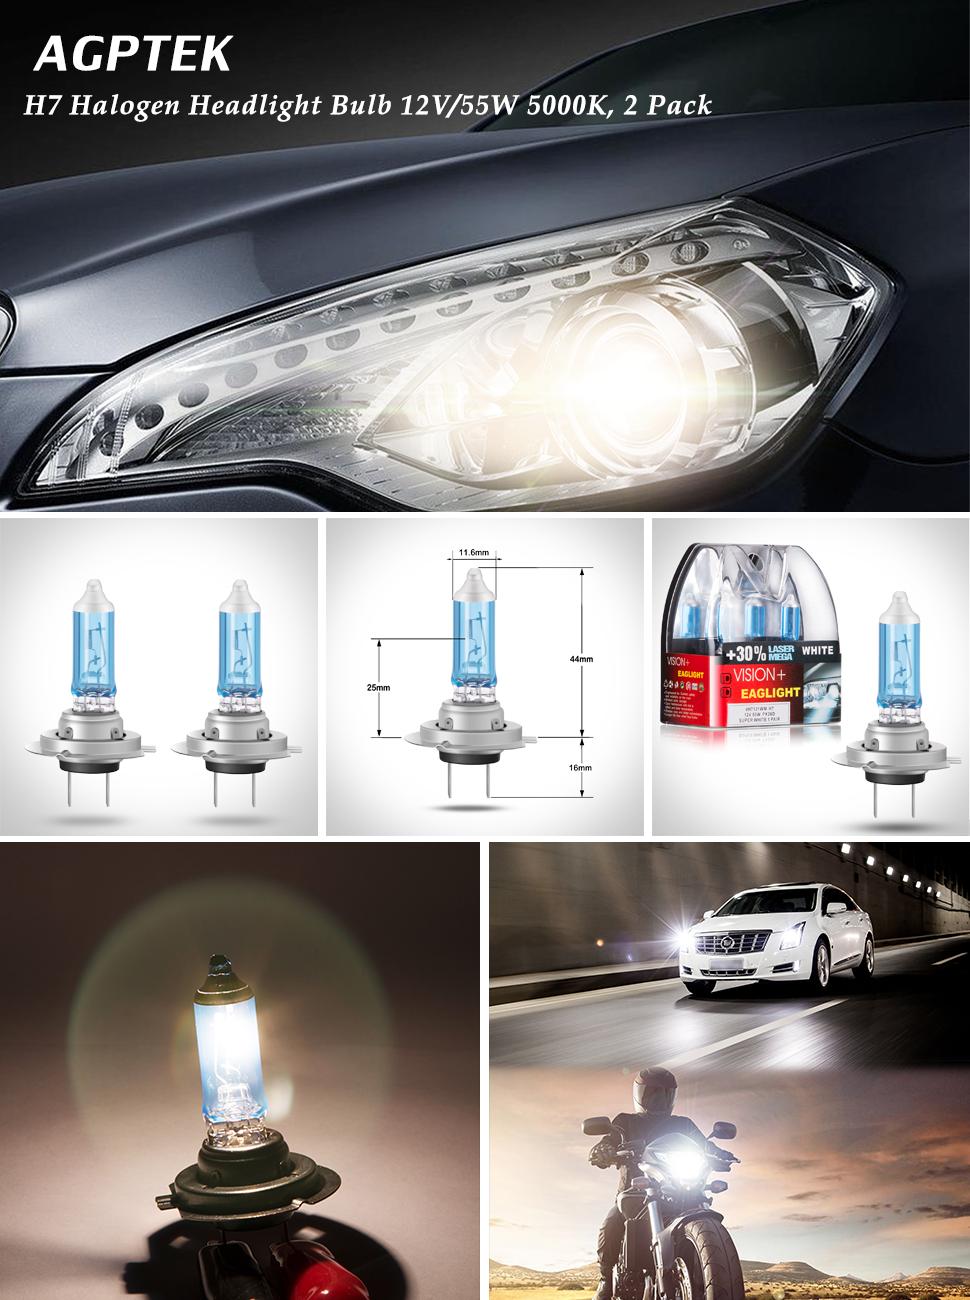 Amazon Com Agptek H7 Halogen Headlight Bulb 12v 55w 5000k